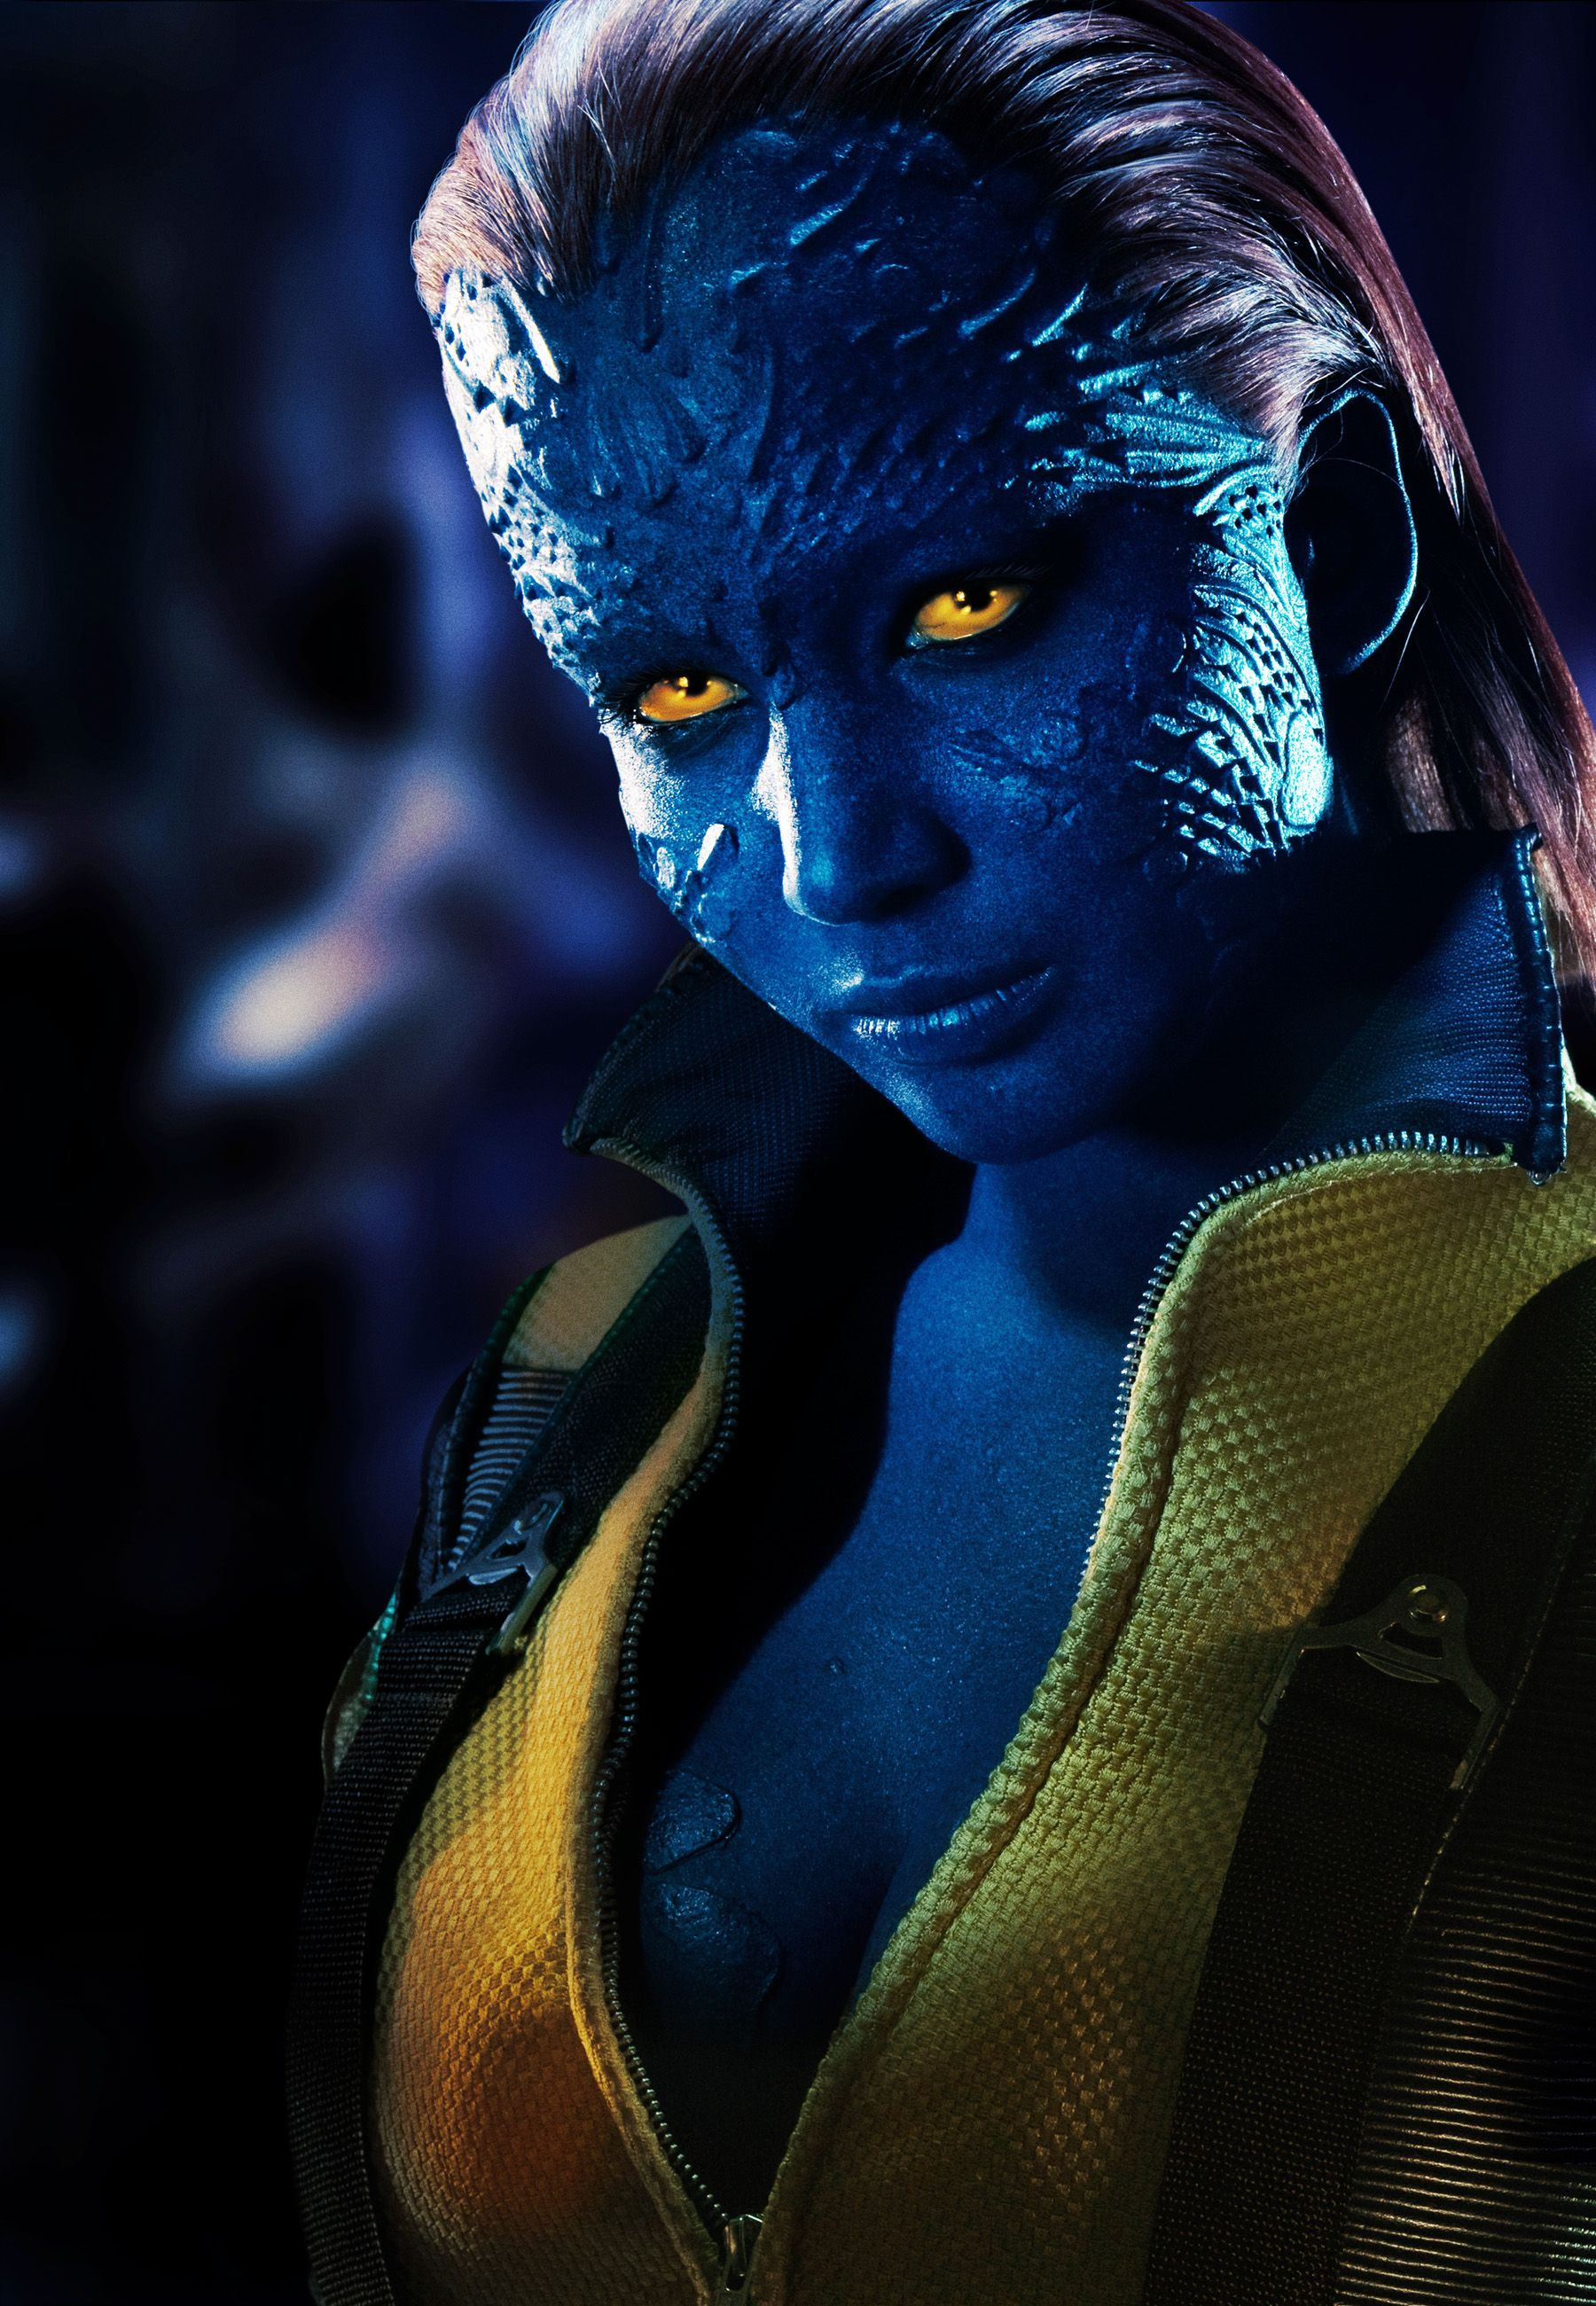 Mystique X Men Movies Wiki Mystique Xmen Jennifer Lawrence Mystique Marvel Heroes